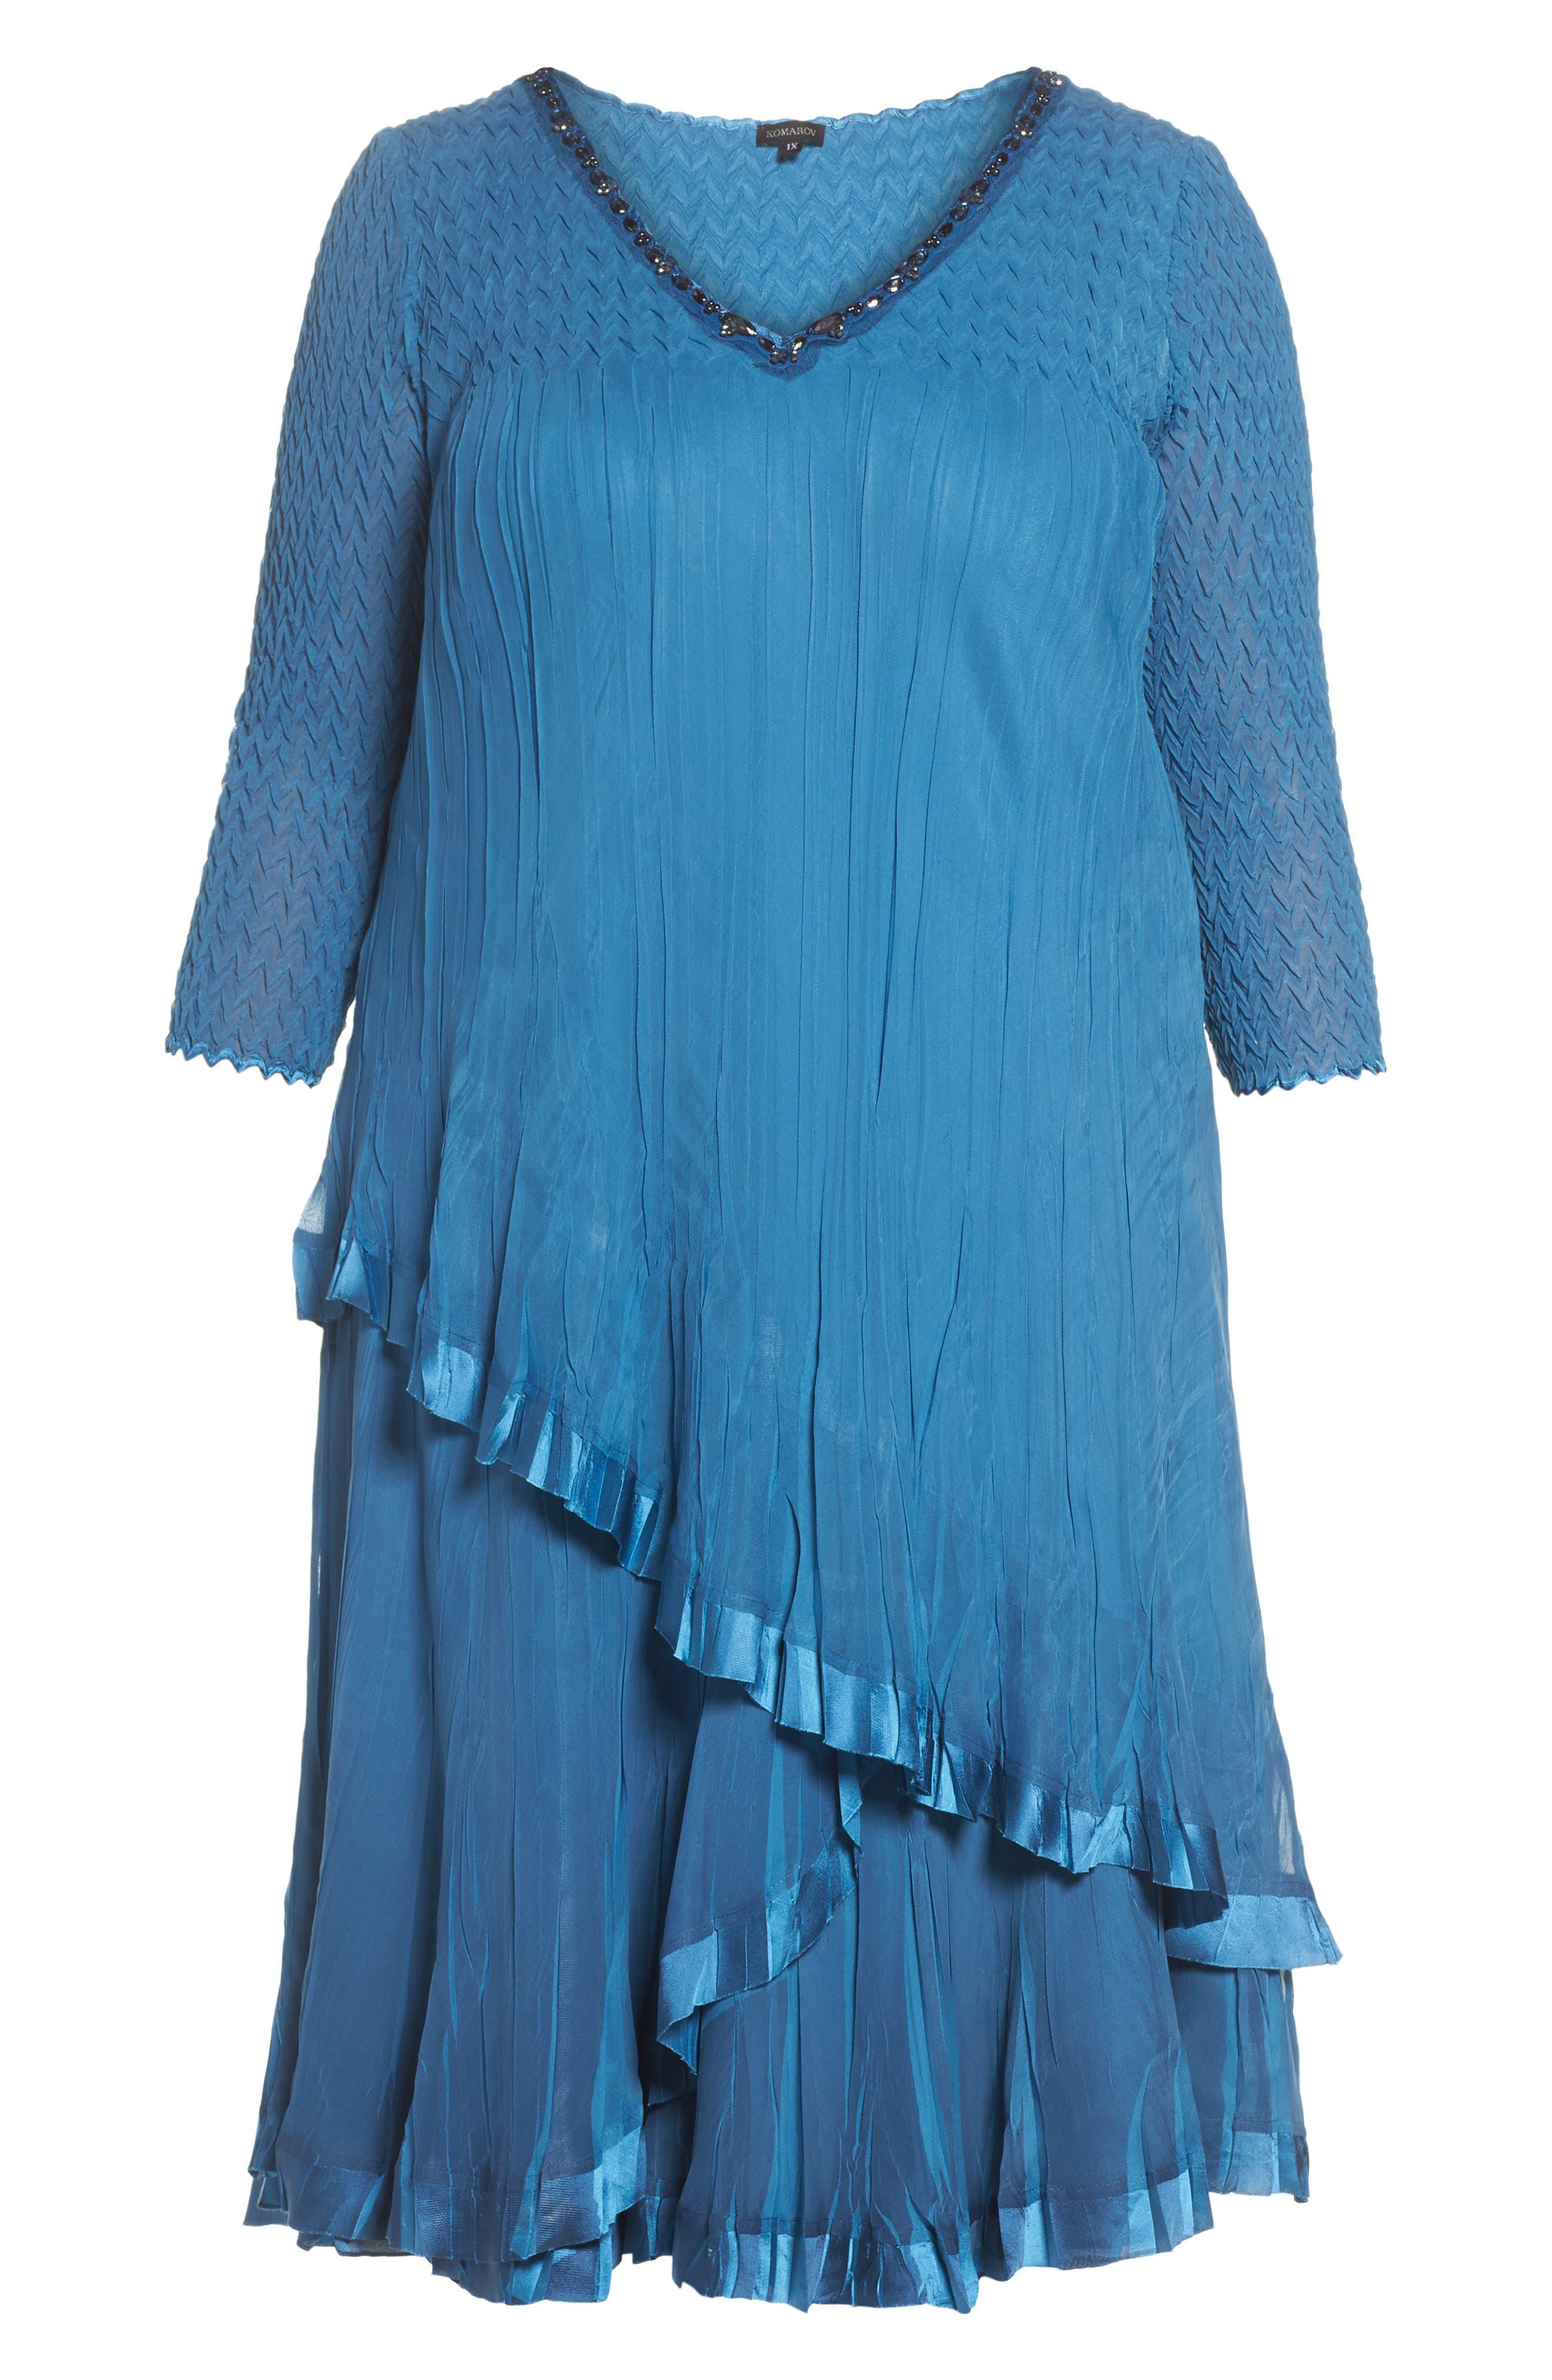 Dress Tiered Chiffon & Charmeuse Dress,                             Alternate thumbnail 6, color,                             Blue Dusk Night Ombre